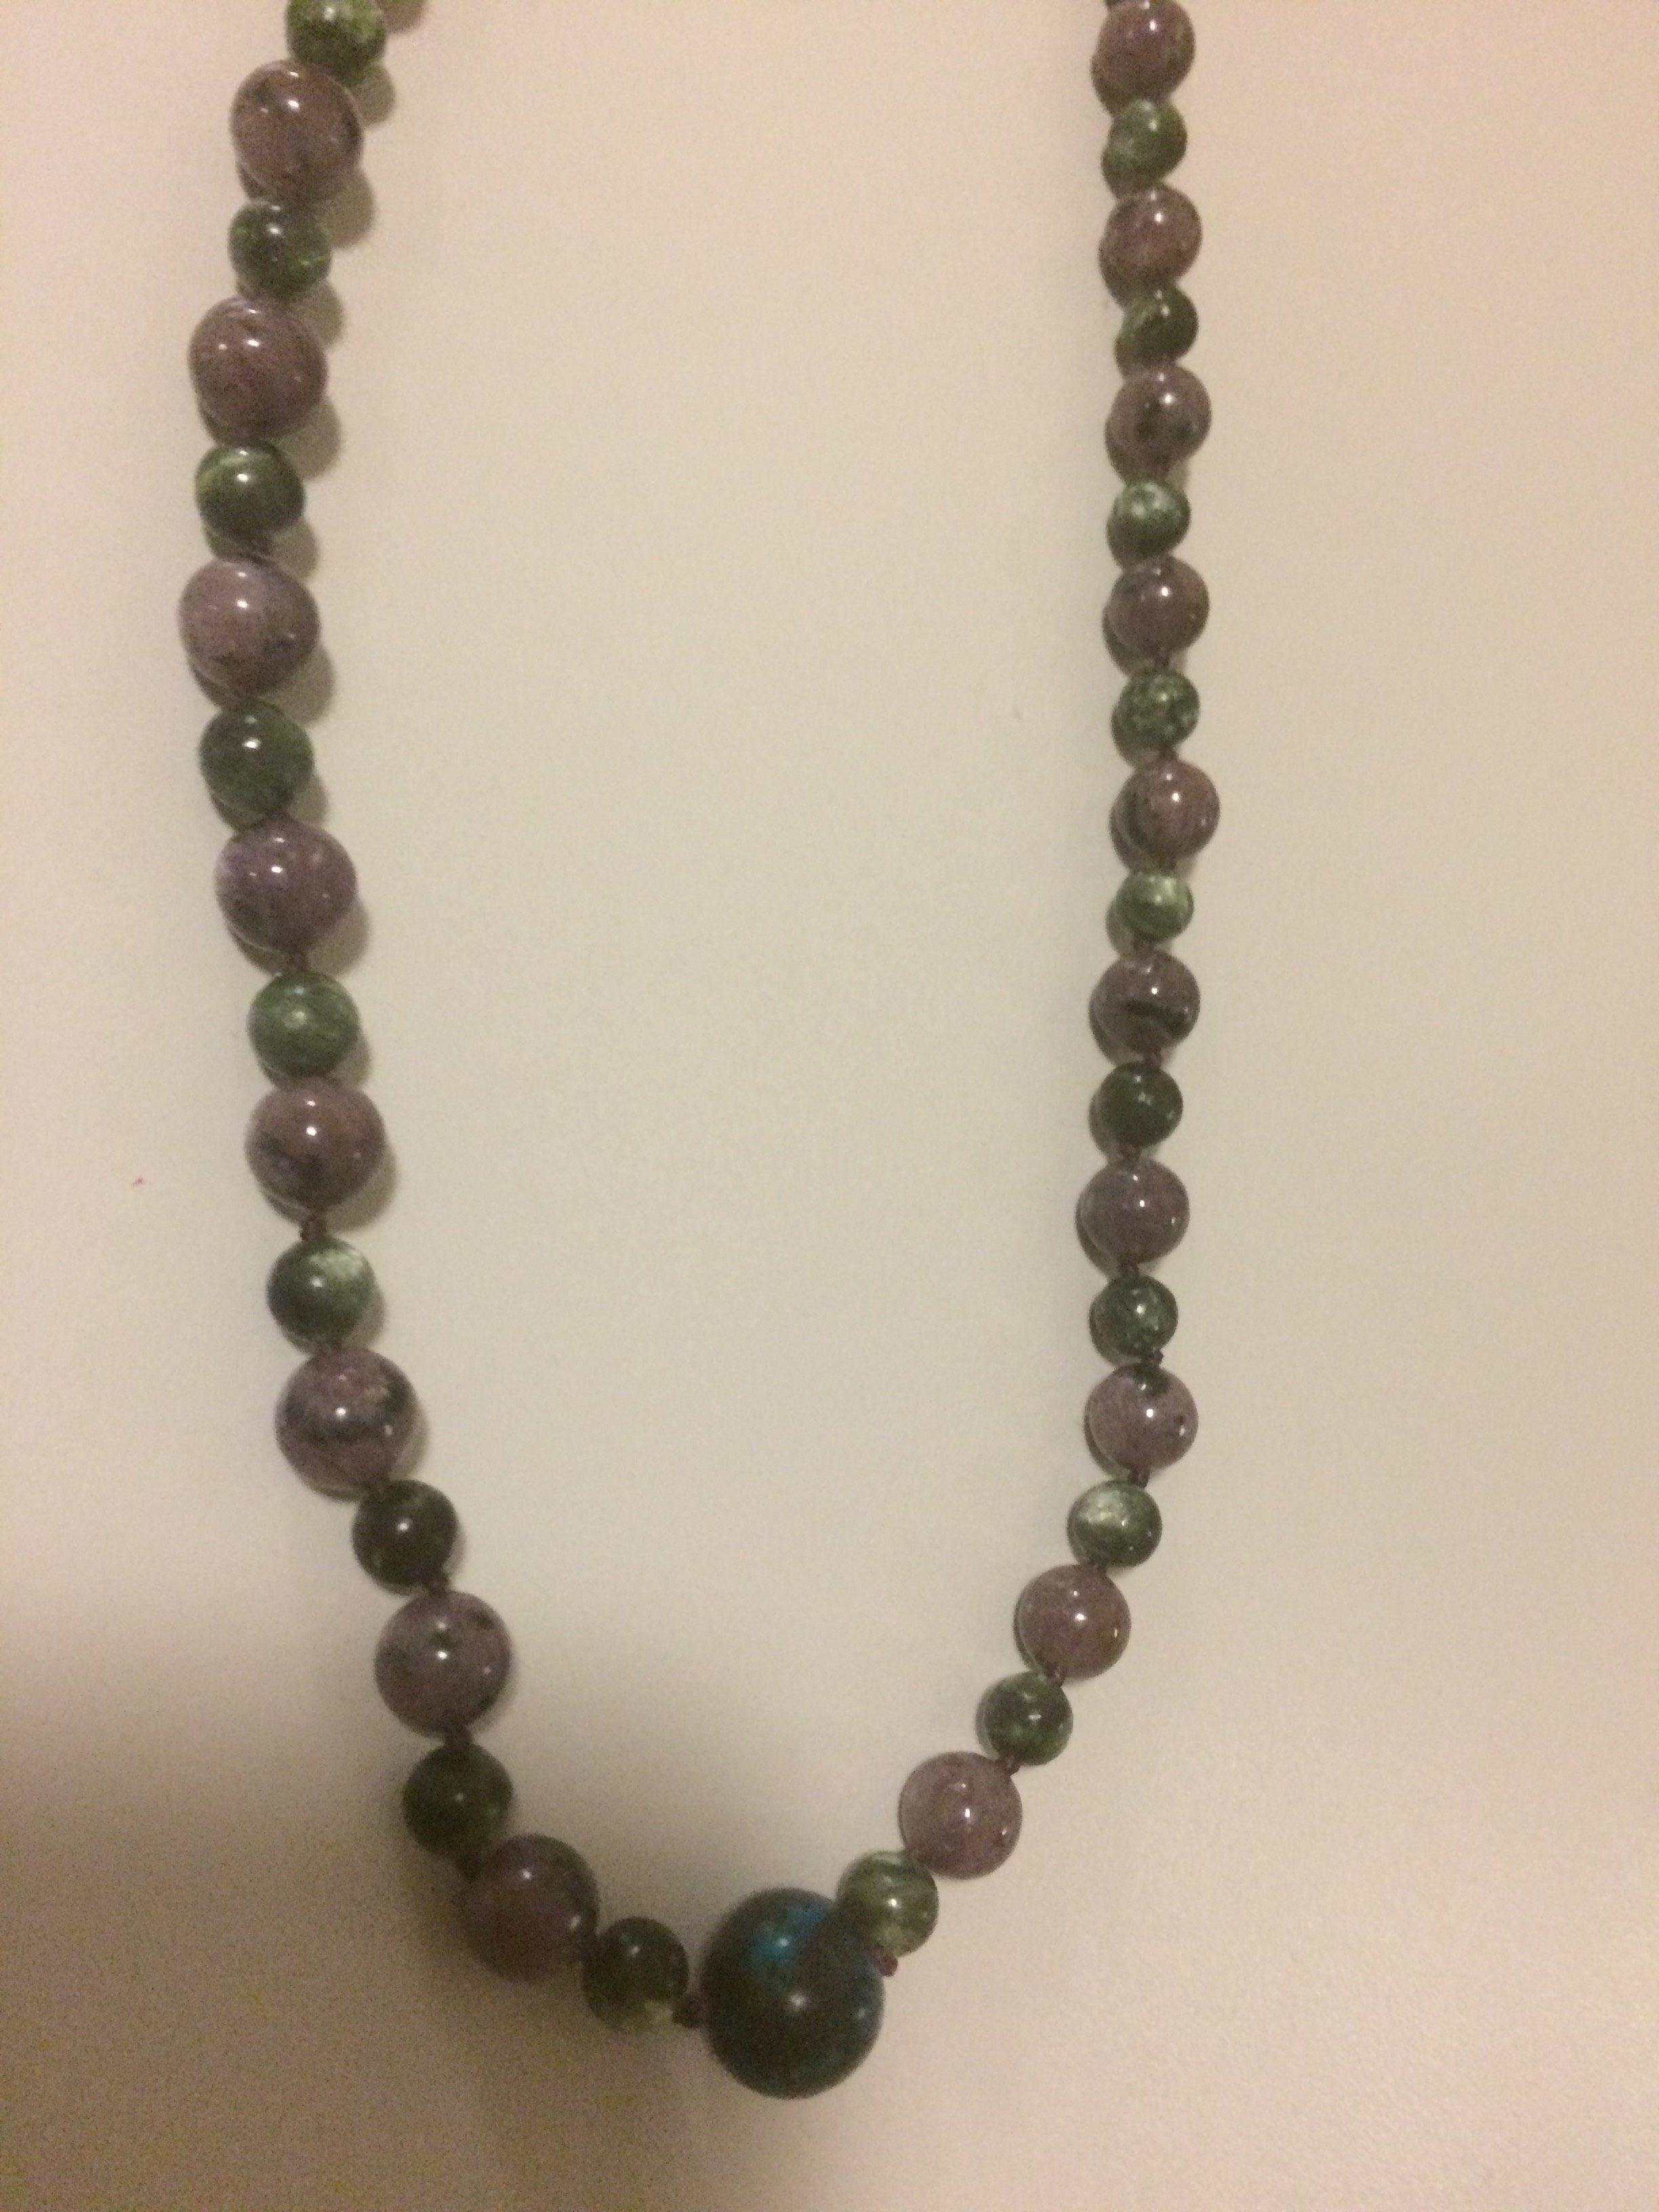 Charoite and Seraphinite Sterling Silver Necklace